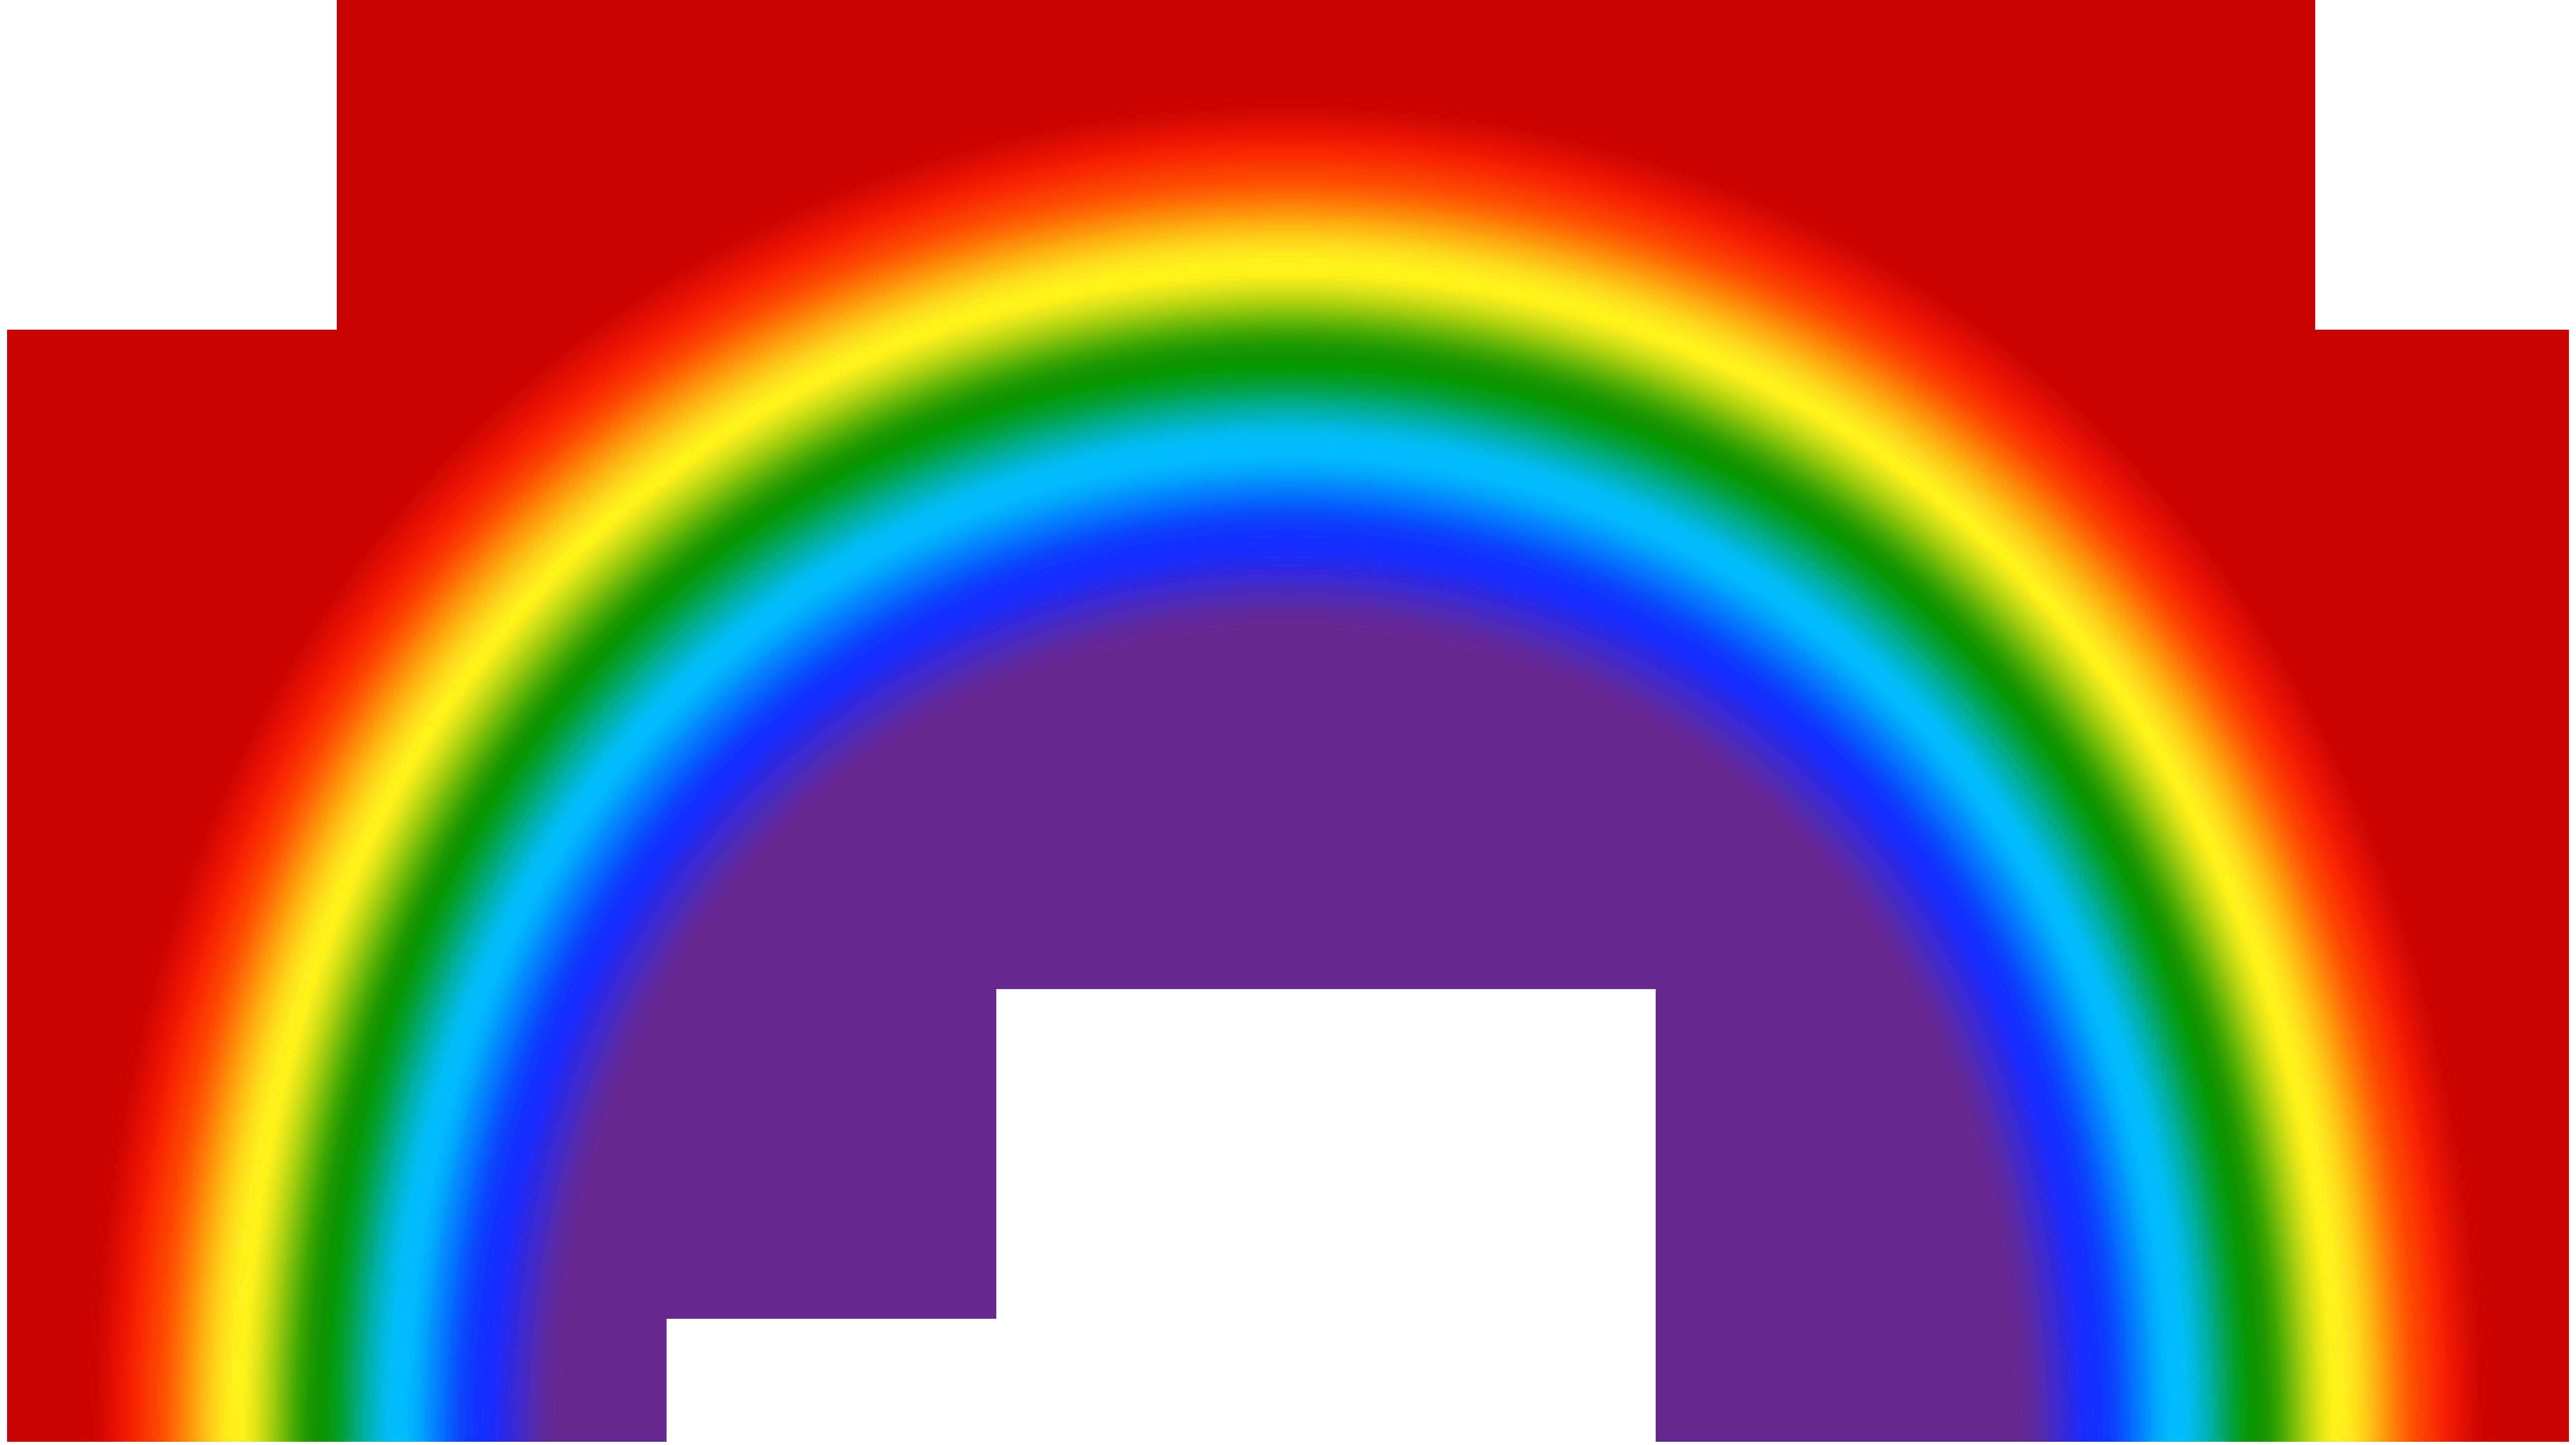 Transparent Rainbow Clip Art Image.